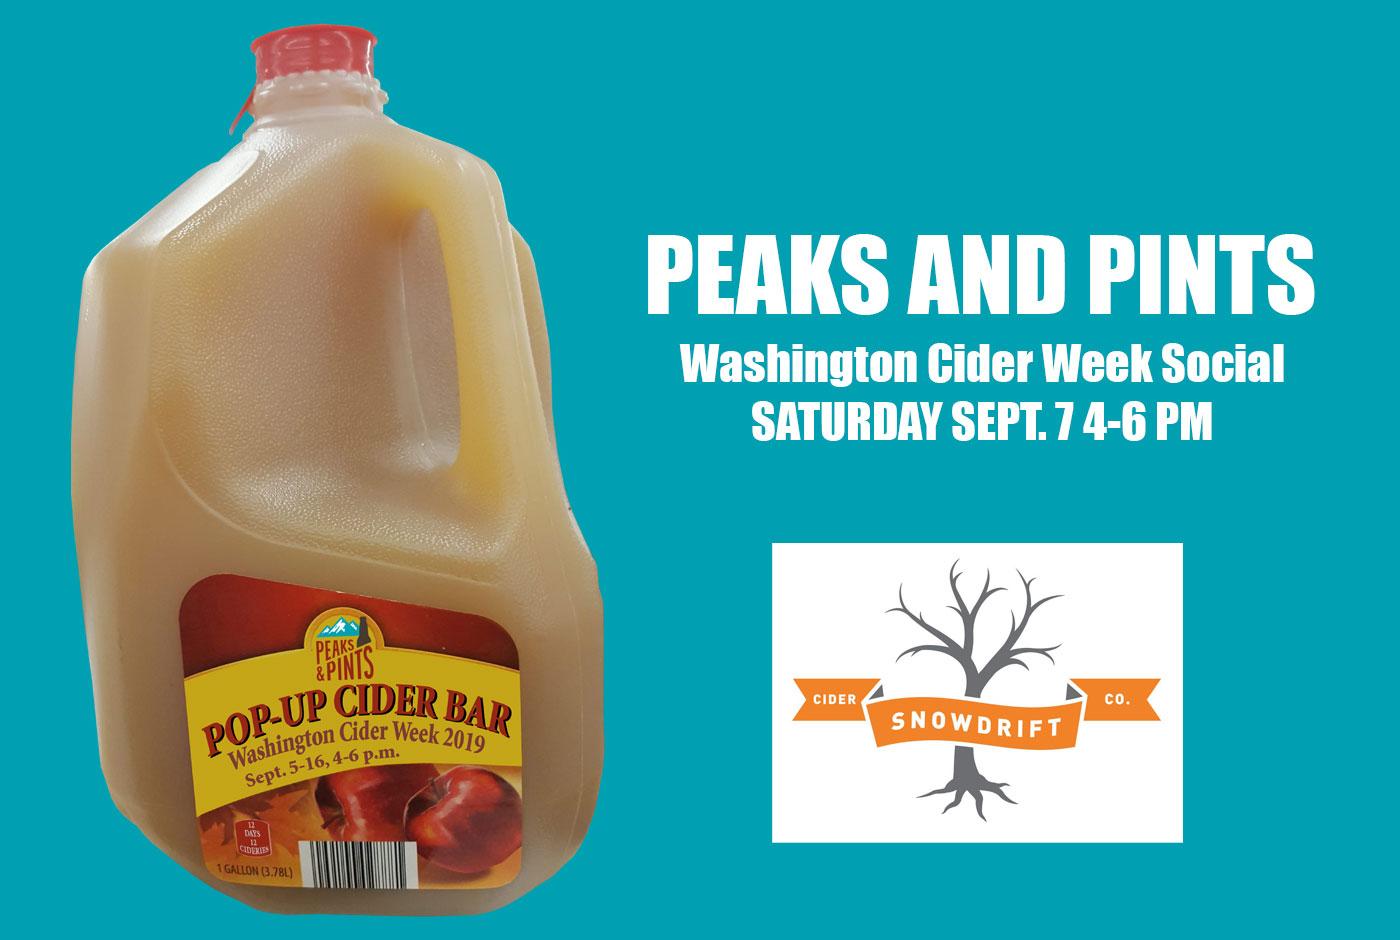 Peaks-and-Pints-Washington-Cider-Week-Social-Snowdrift-Calendar